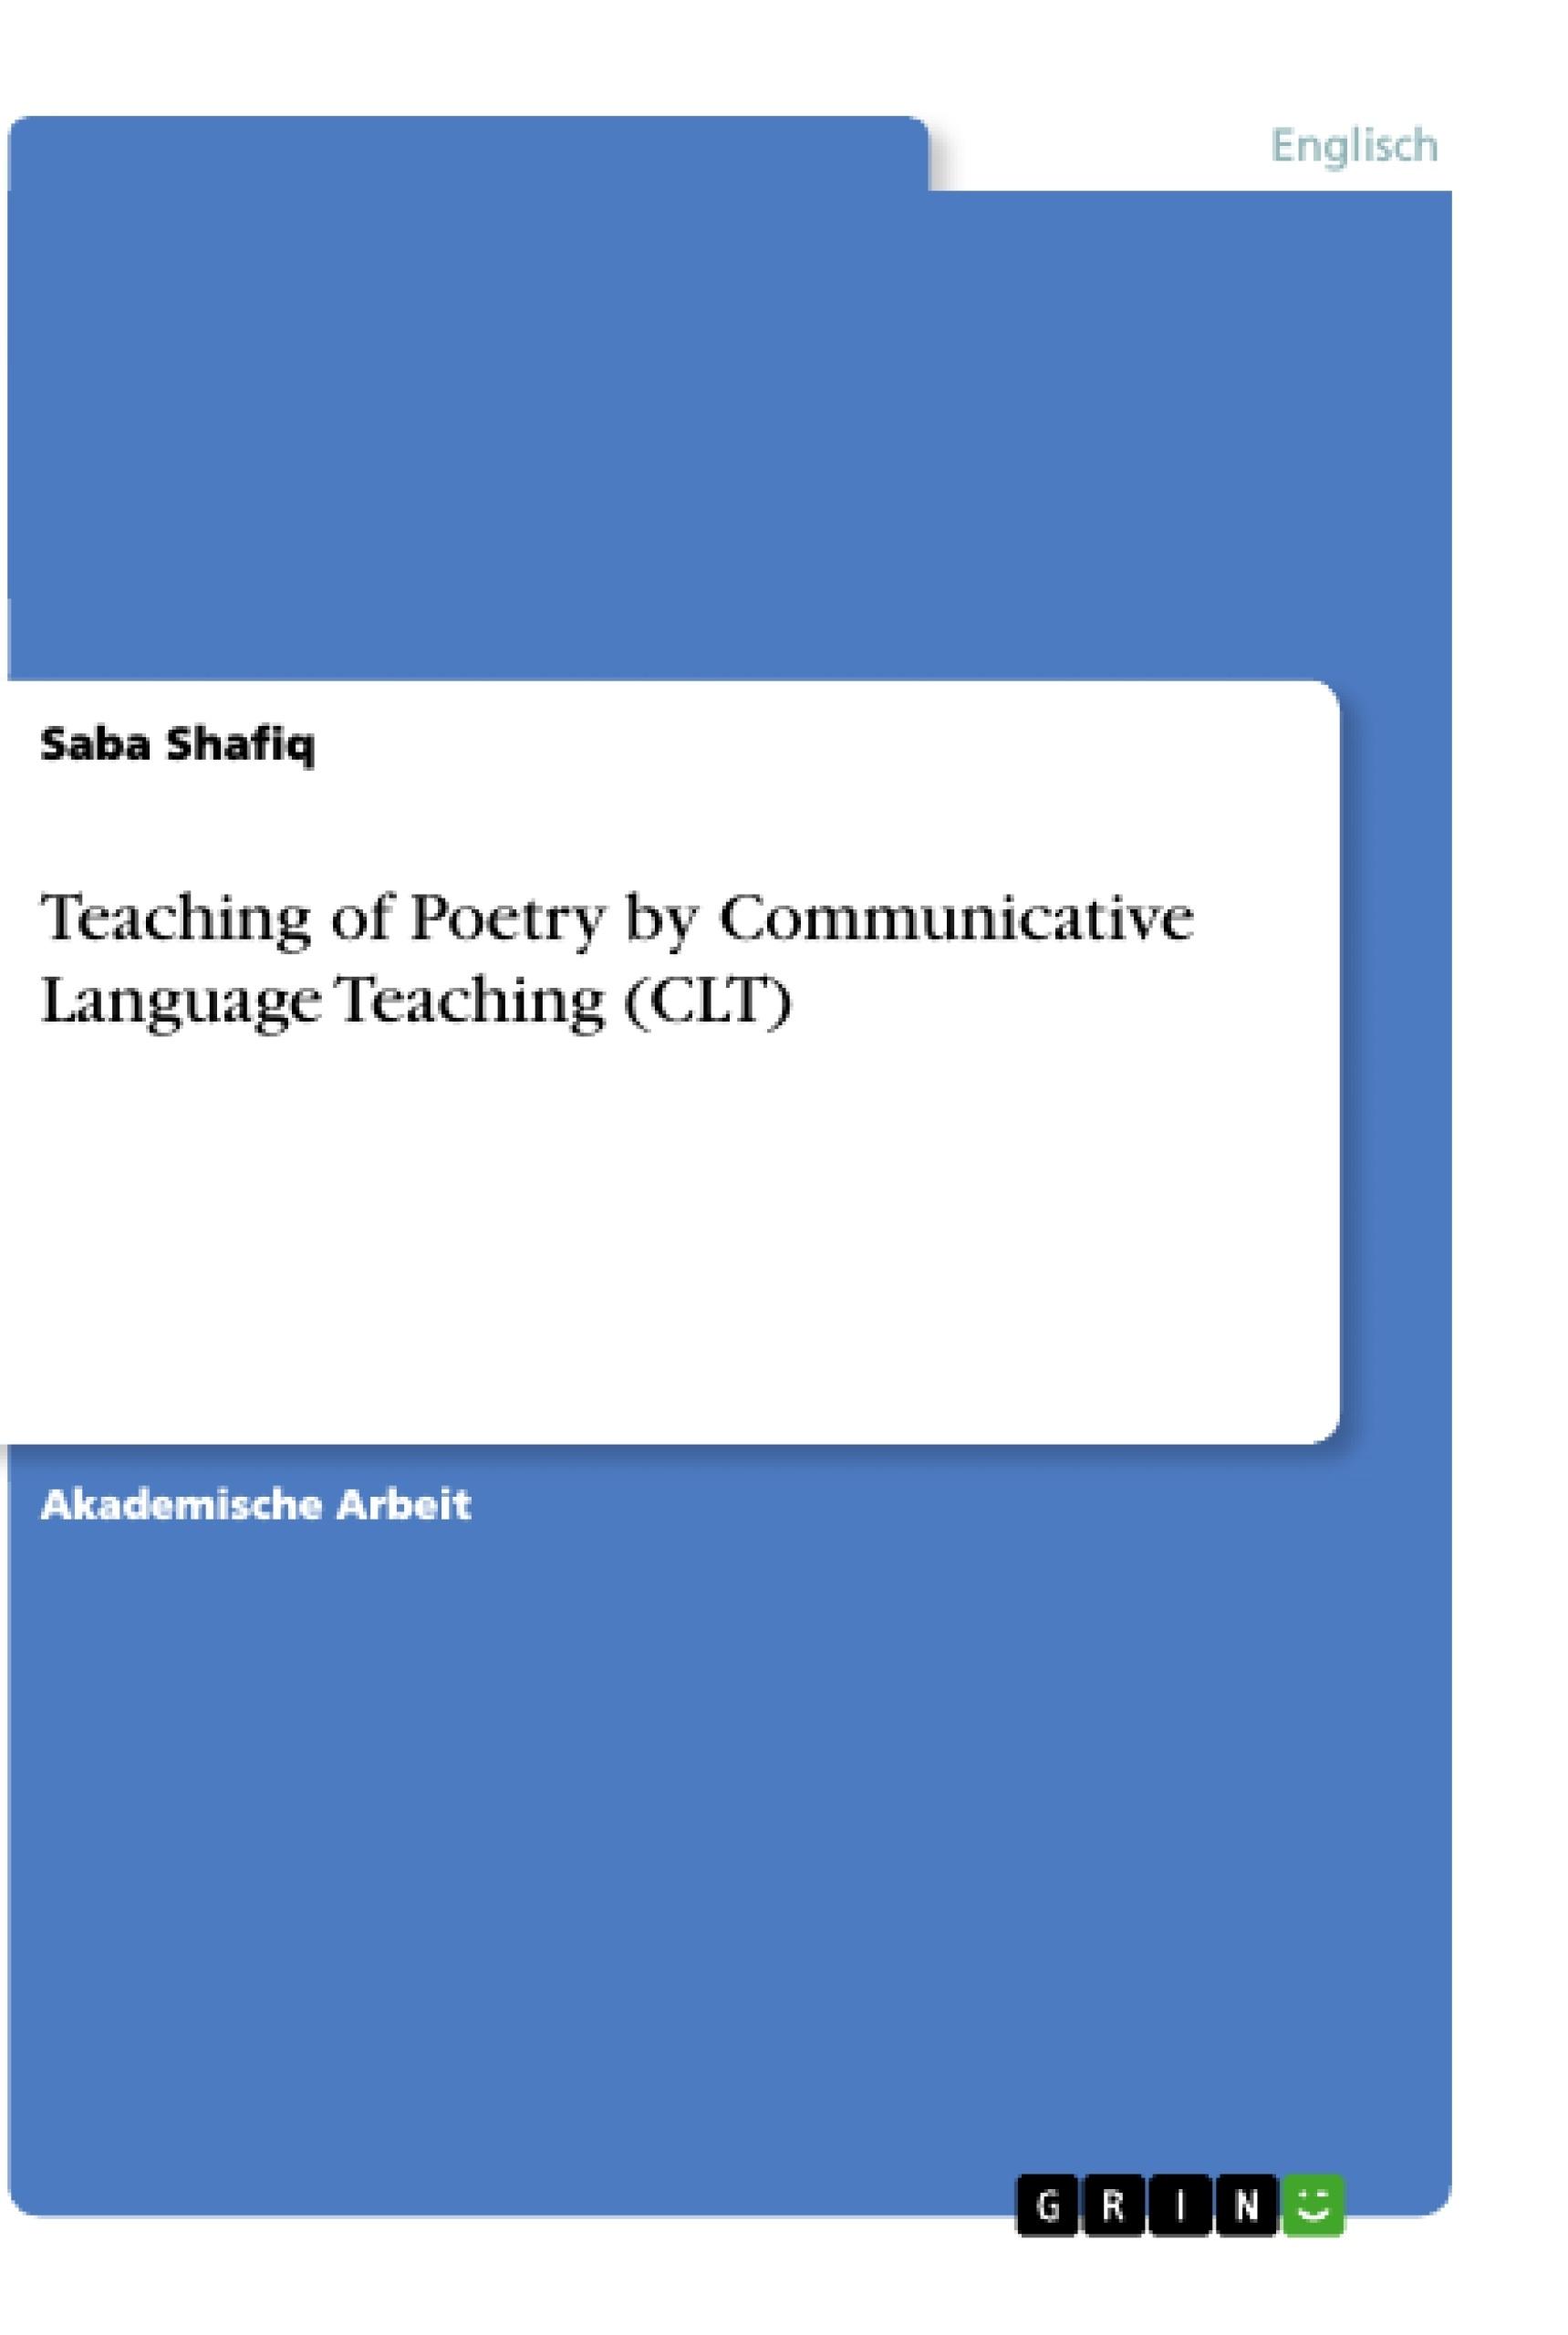 Titel: Teaching of Poetry by Communicative Language Teaching (CLT)